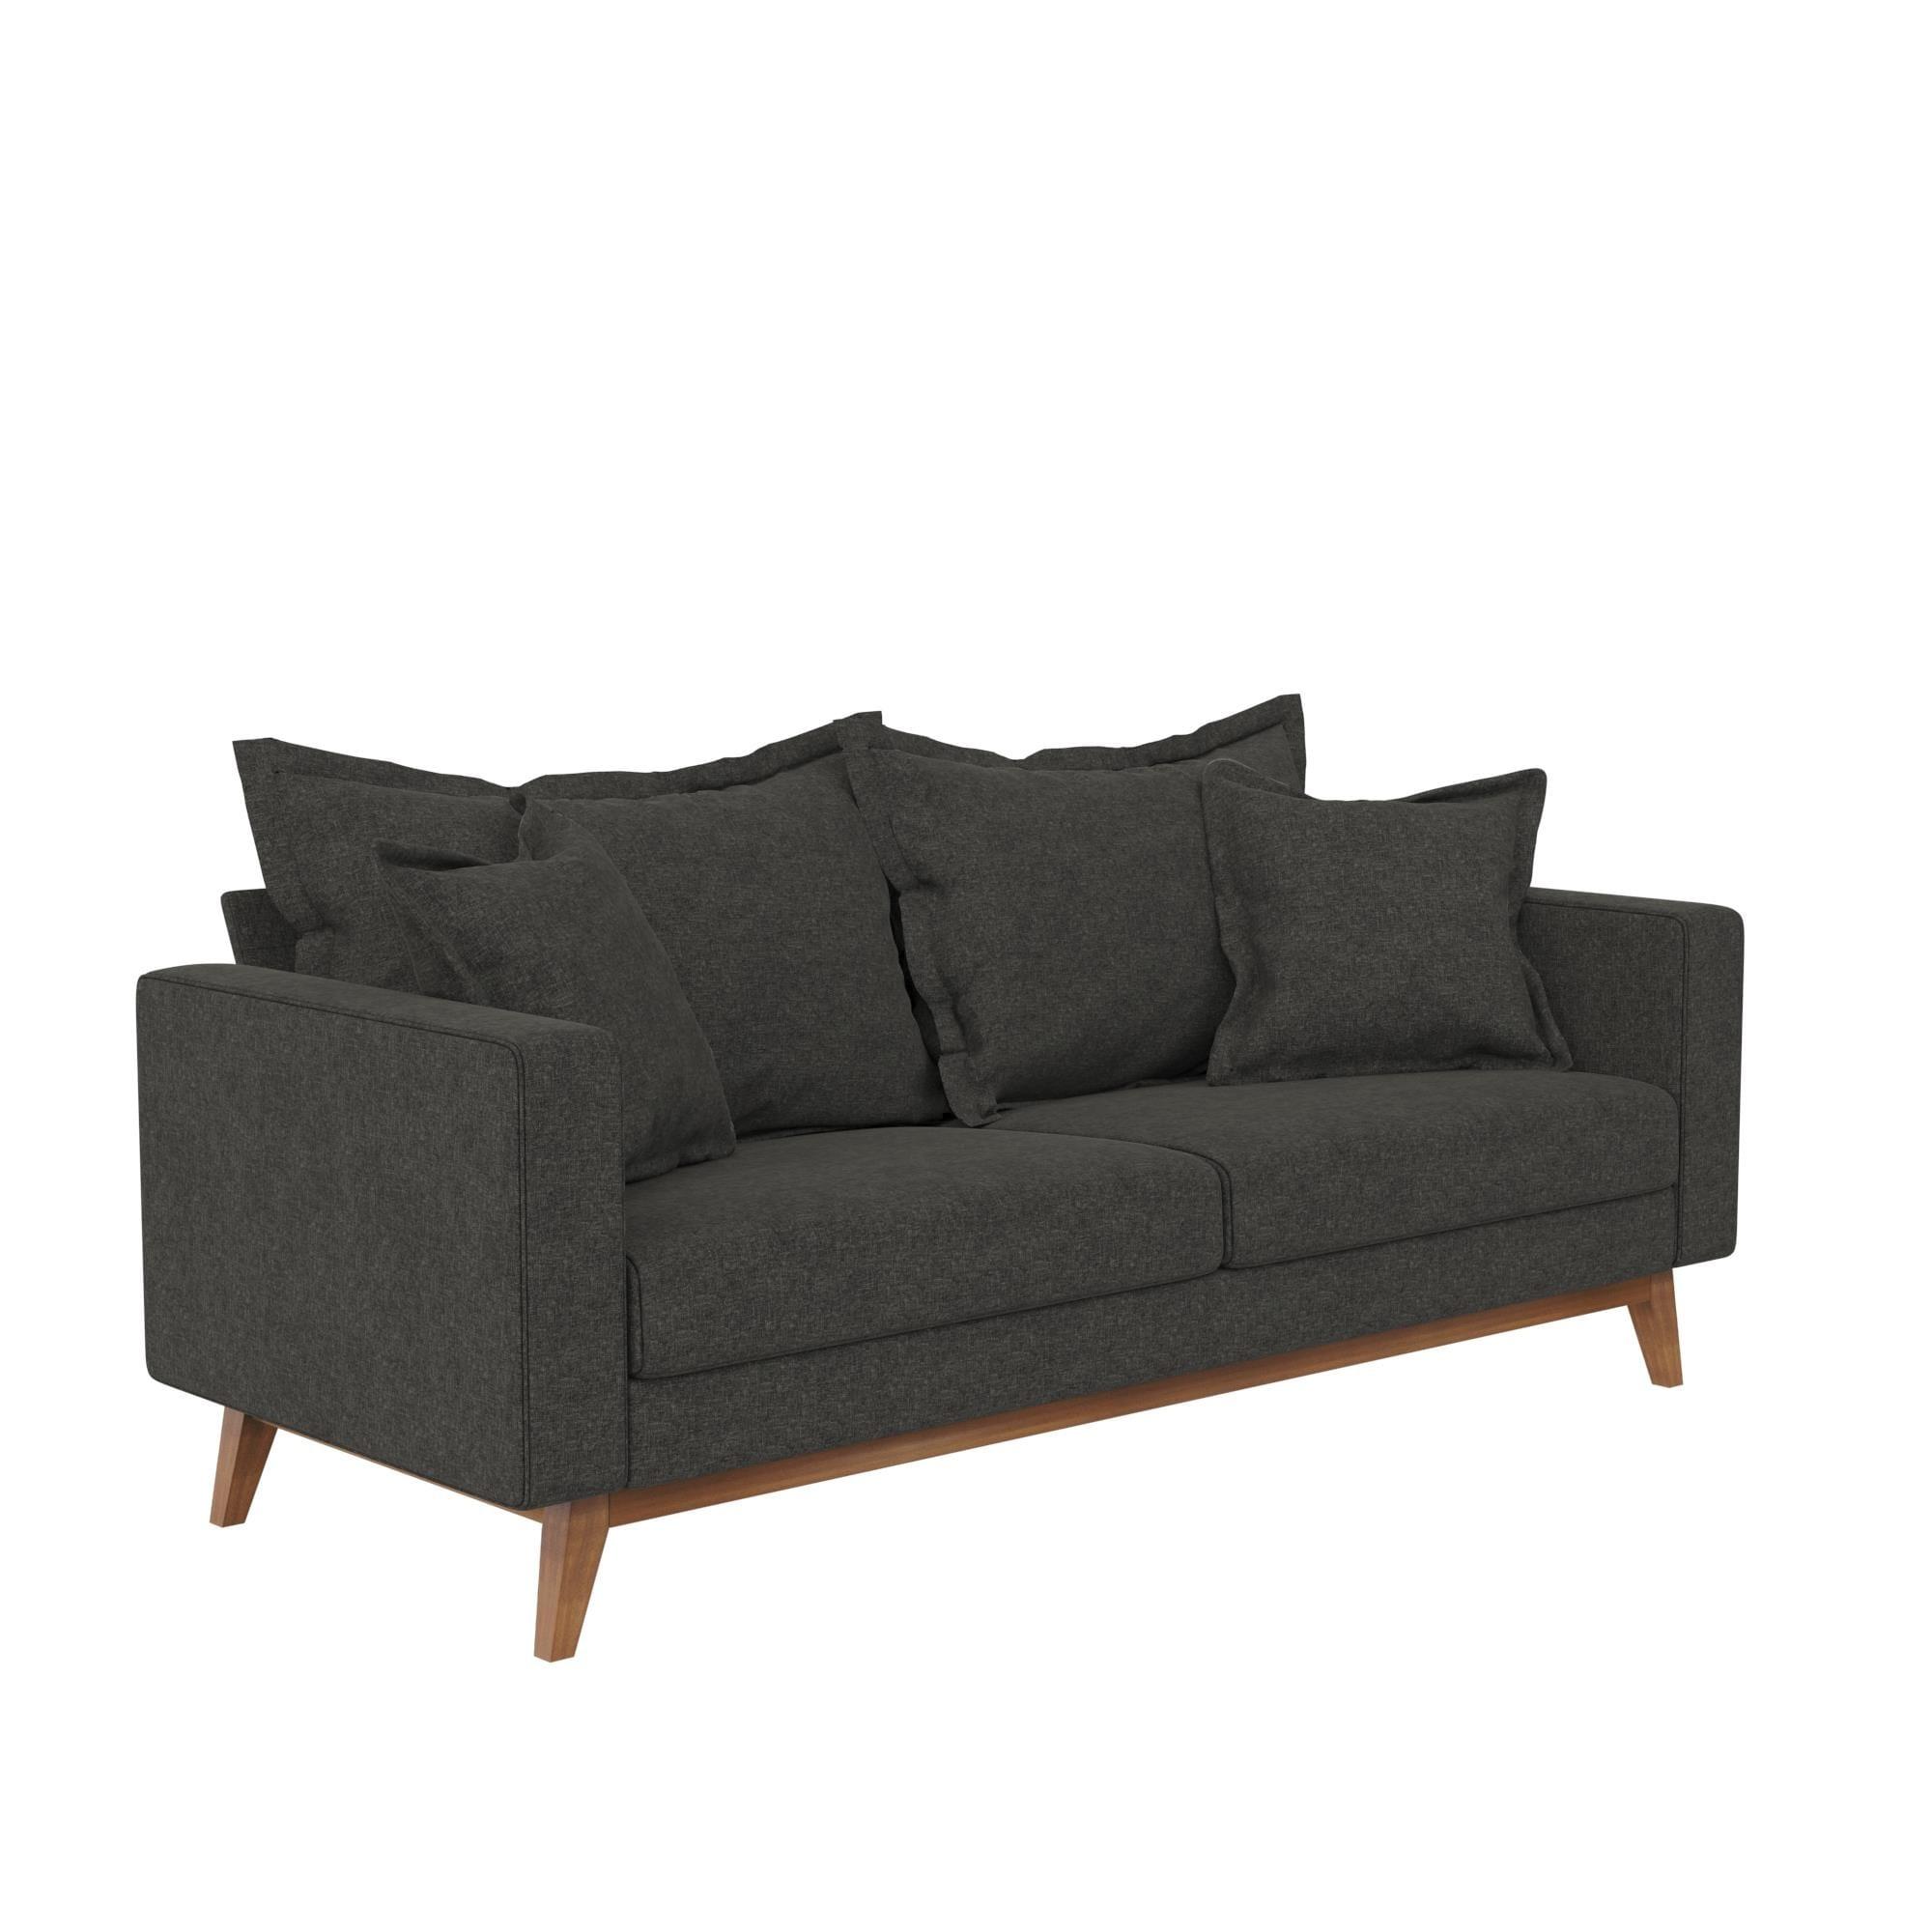 Avenue Greene Marielle Pillowback Wood Stretcher Sofa -  DO28124